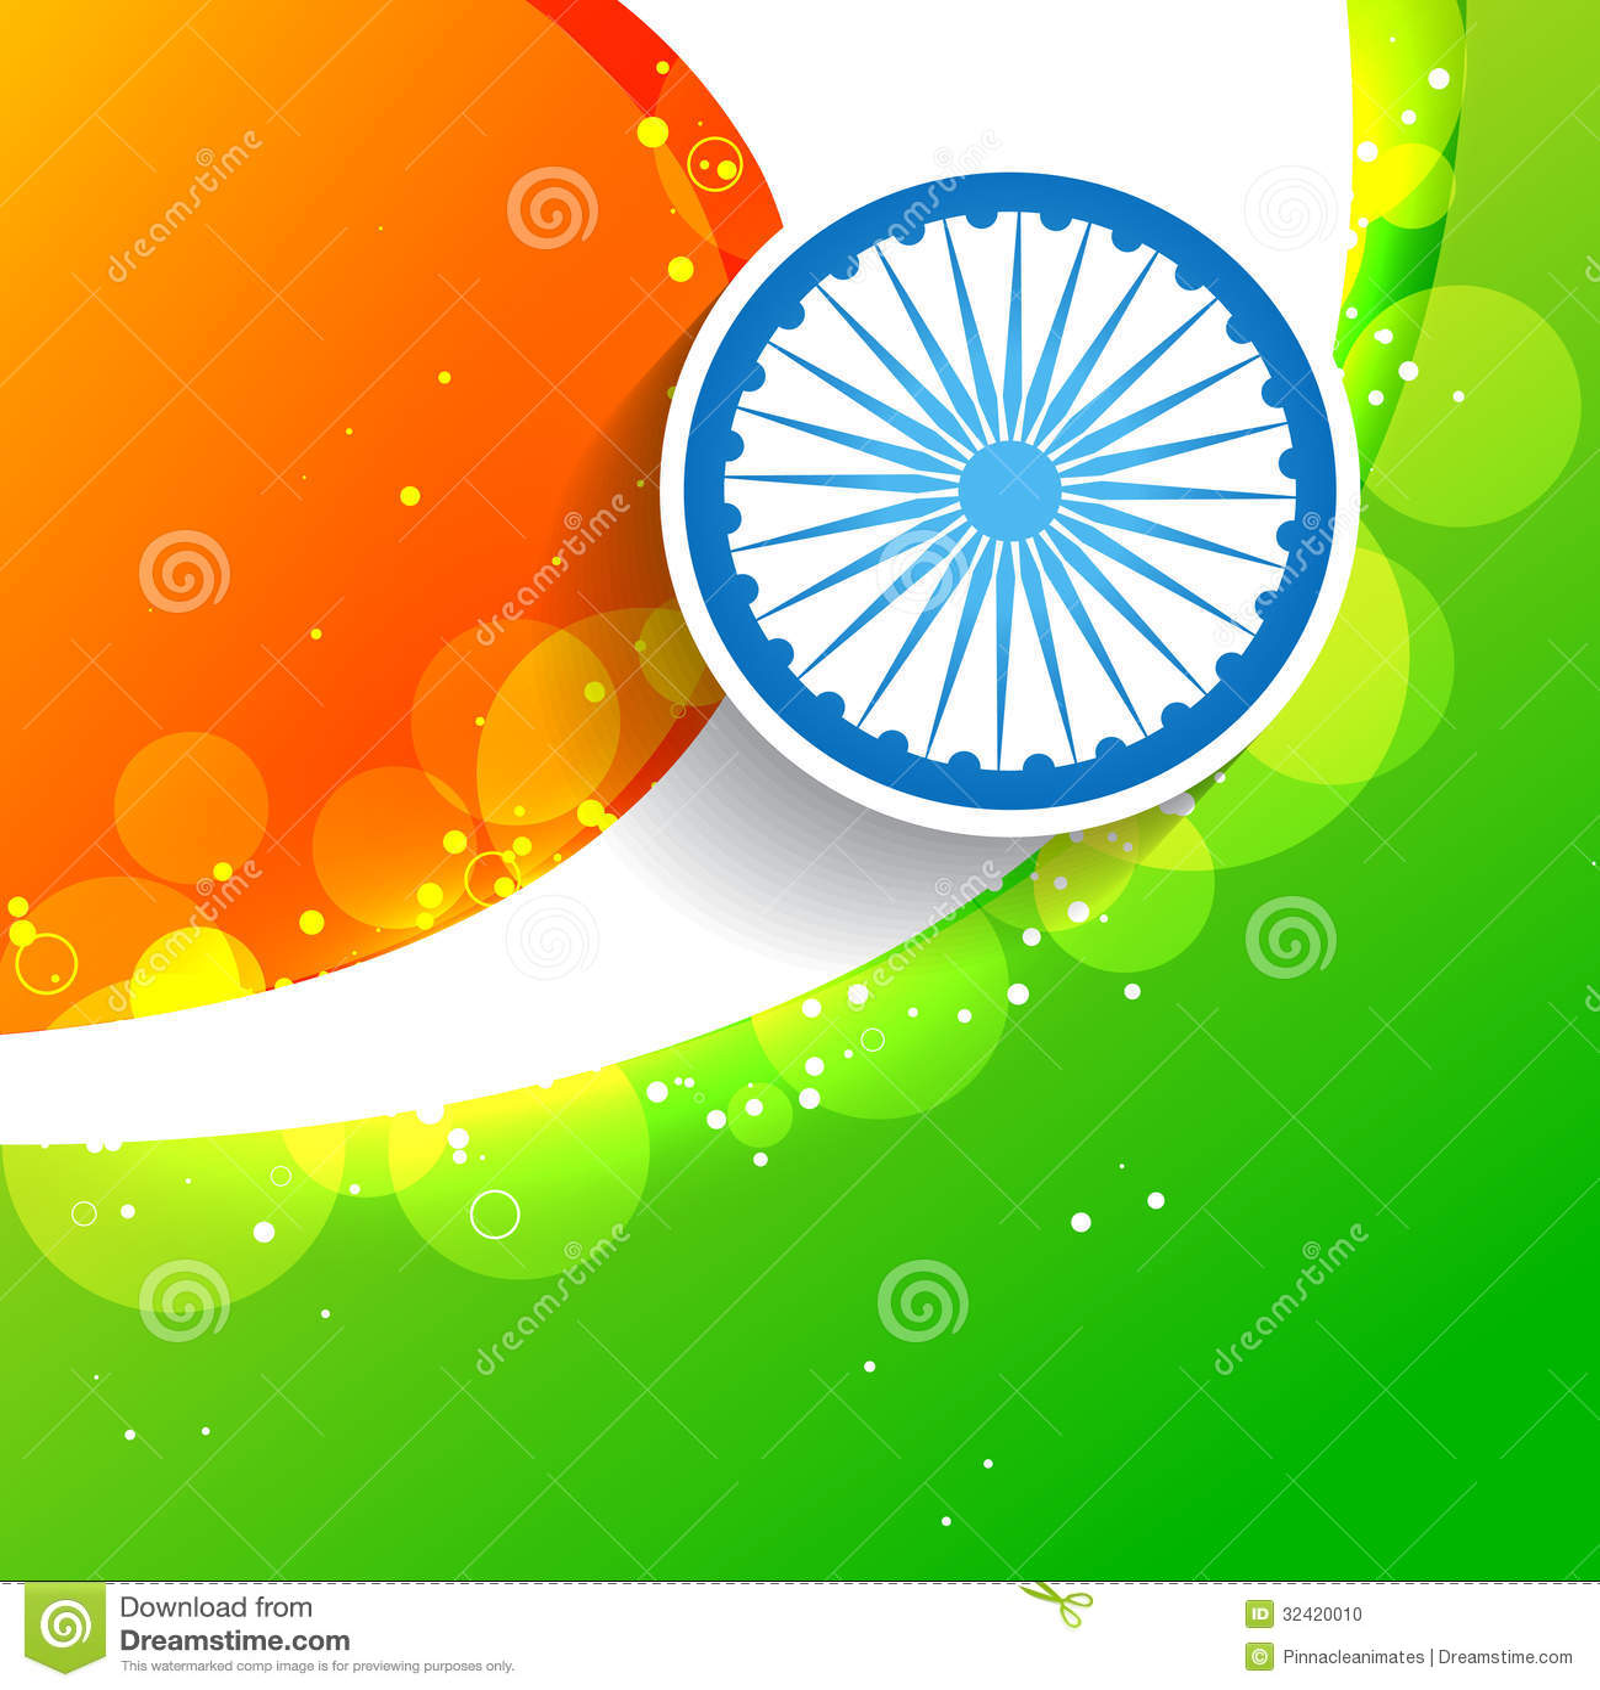 Indian flag image